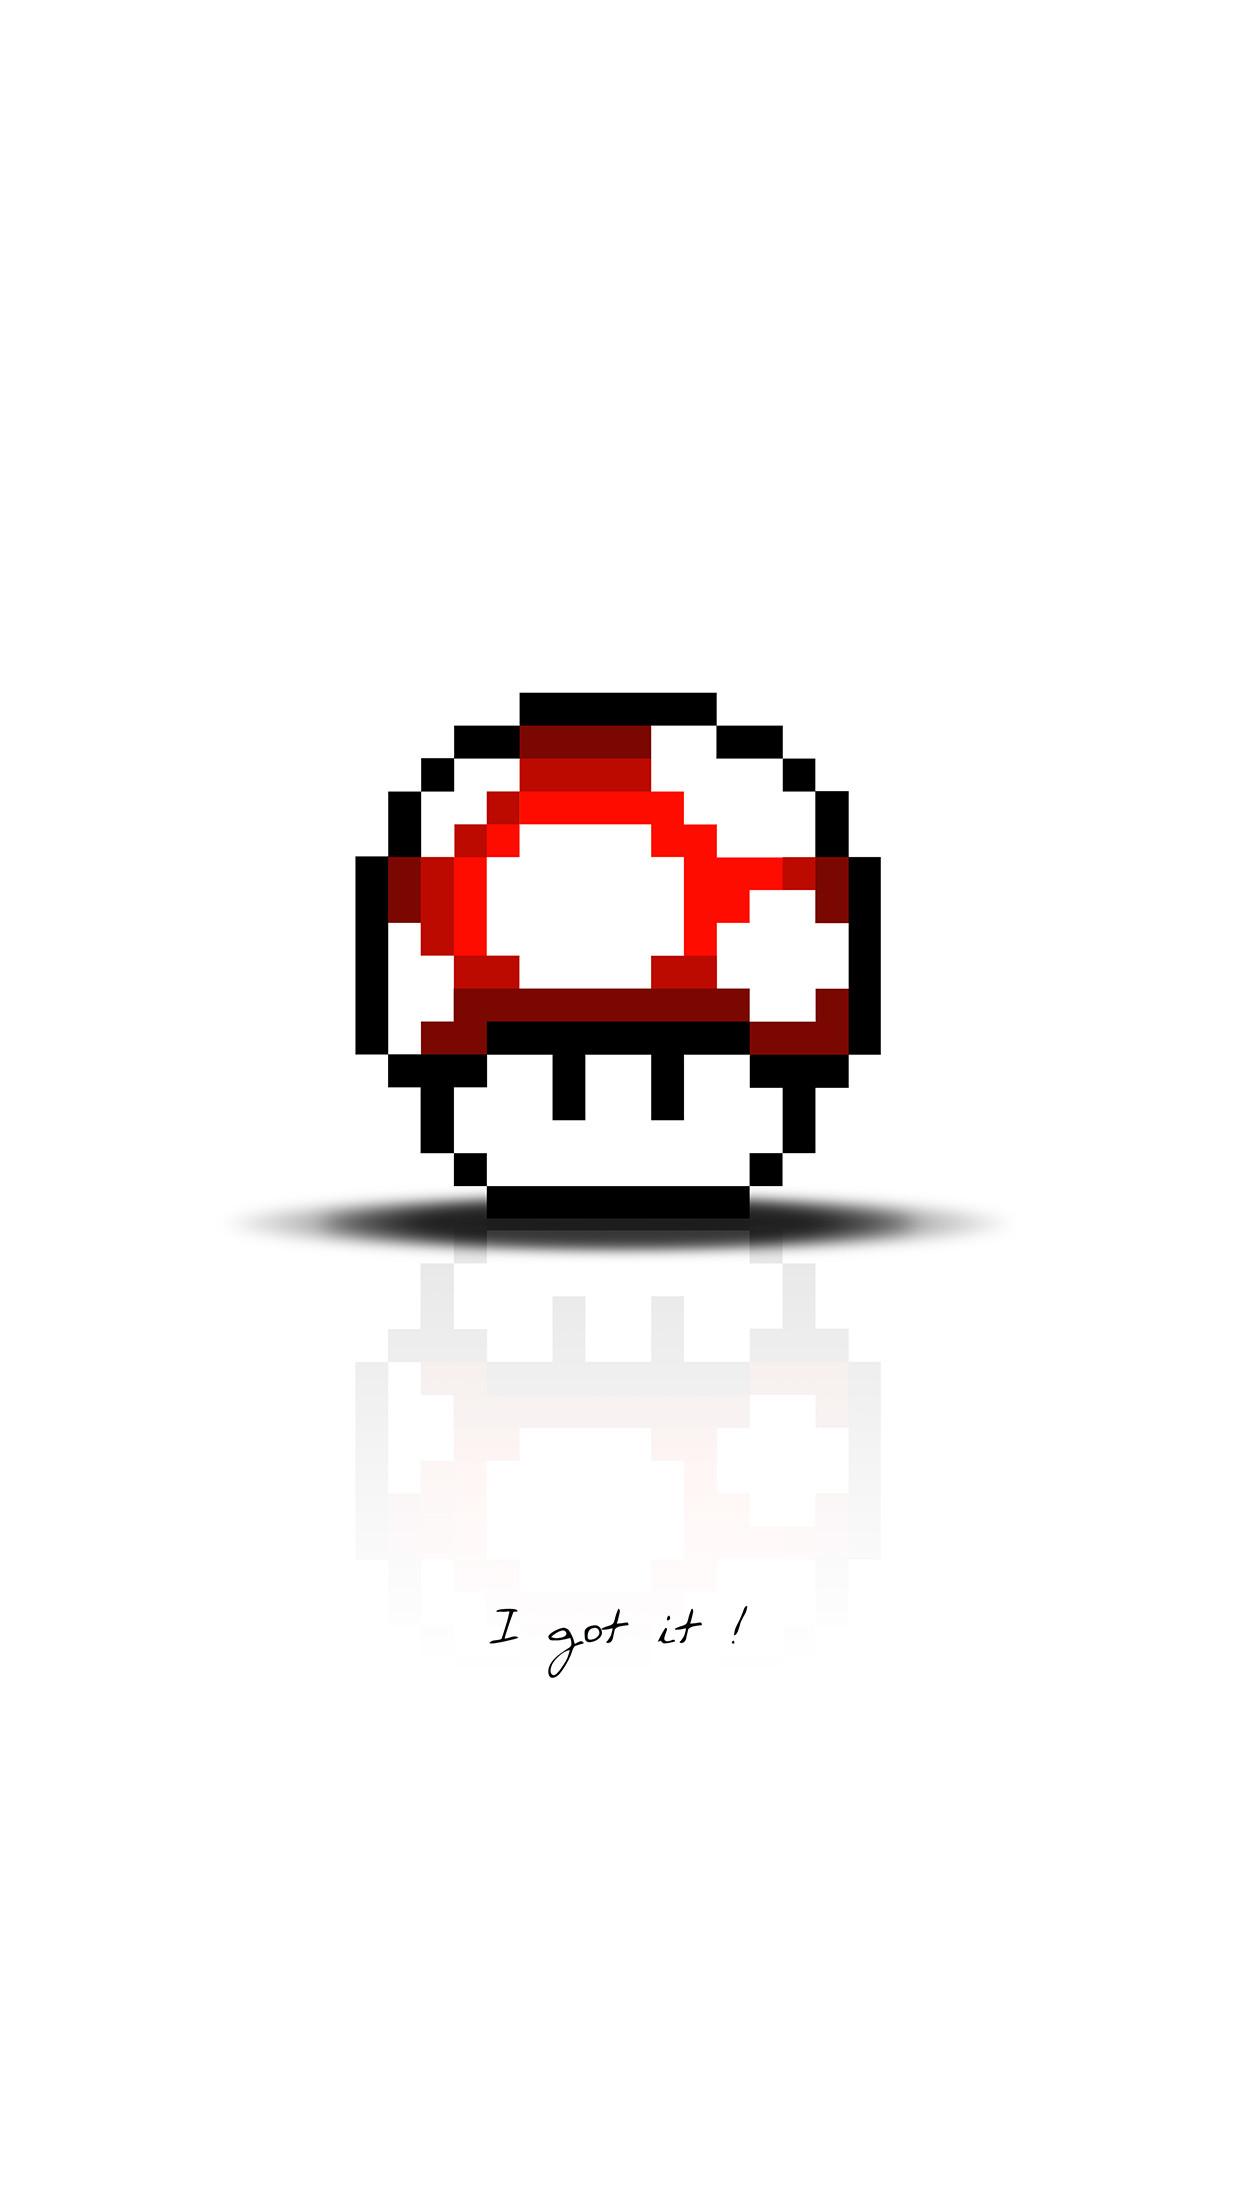 Super Mario Odyssey Wallpaper Iphone X Mario 1up Wallpaper 183 ① Wallpapertag